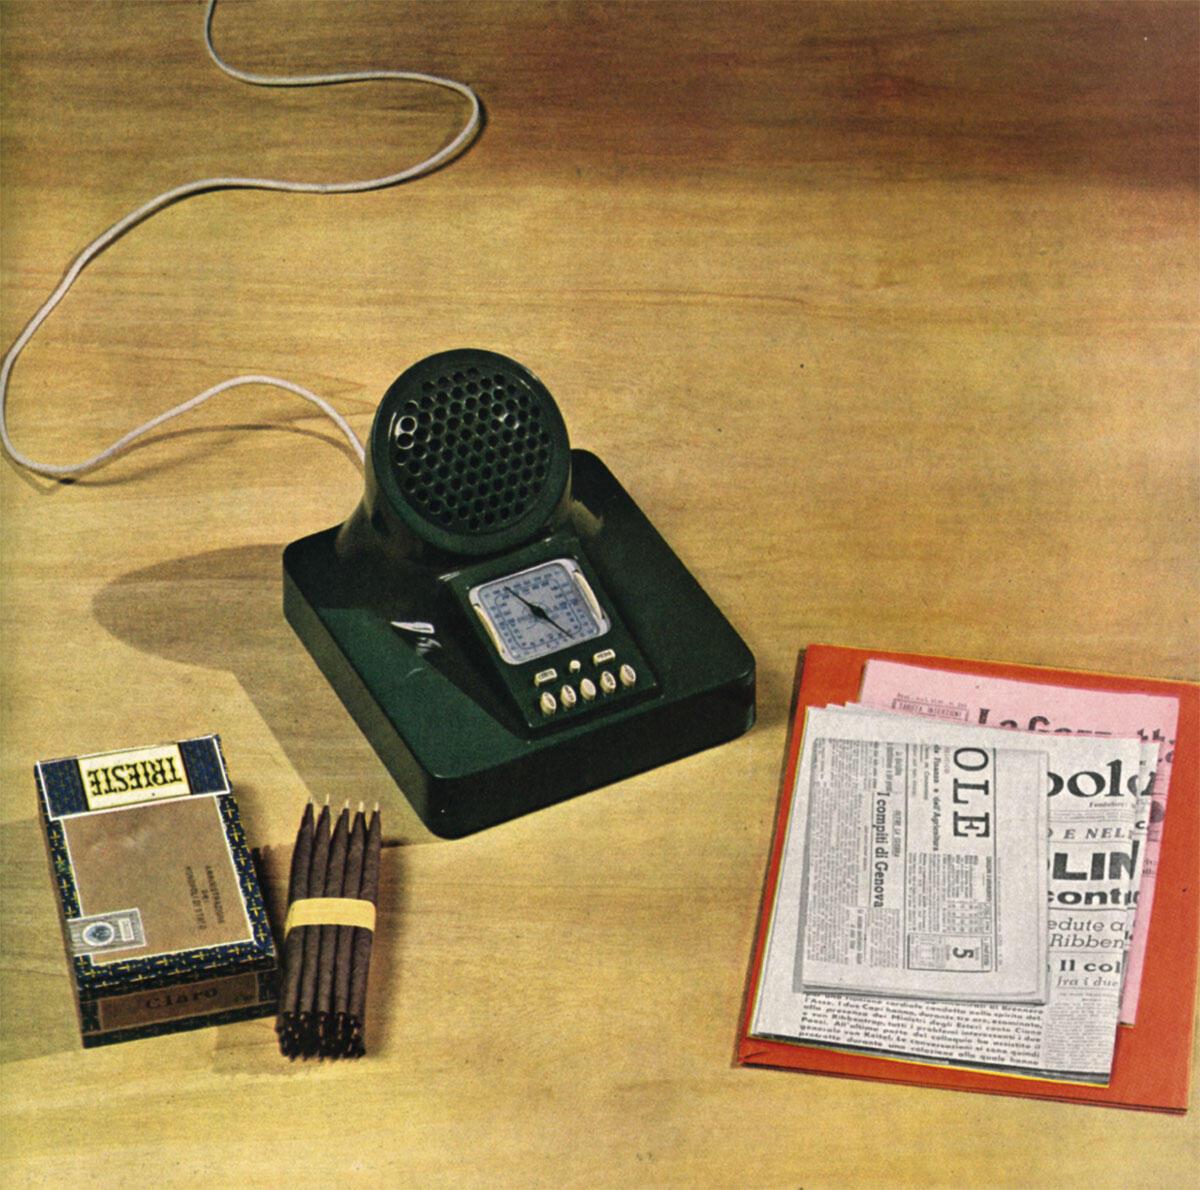 Luigi Caccia Dominioni, Livio und Pier Giacomo Castiglioni: Radioapparat Phonola 547, 1940. Grundfläche 24 × 24 cm, einteiliges Phenolharzgehäuse über Metallchassis.